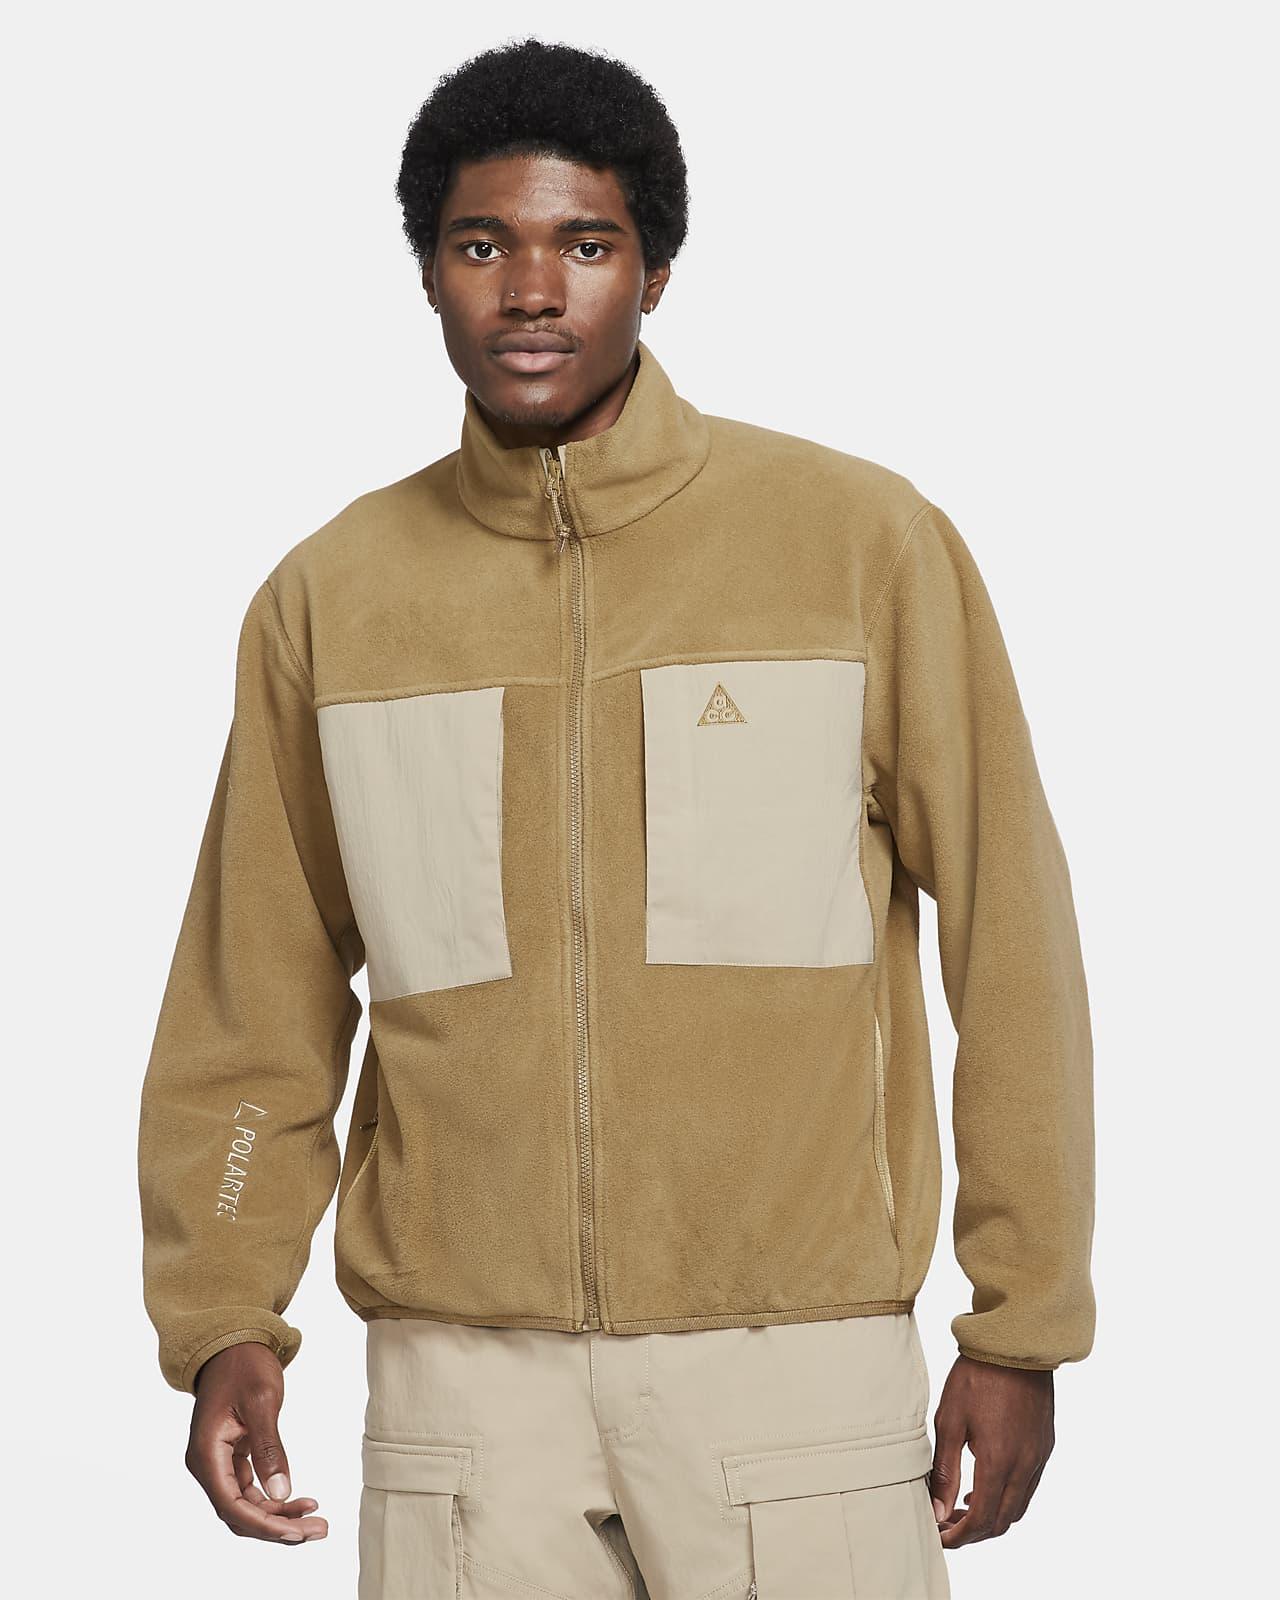 Haut à zip en tissu Fleece Nike ACG Polartec® « Wolf Tree » pour Homme